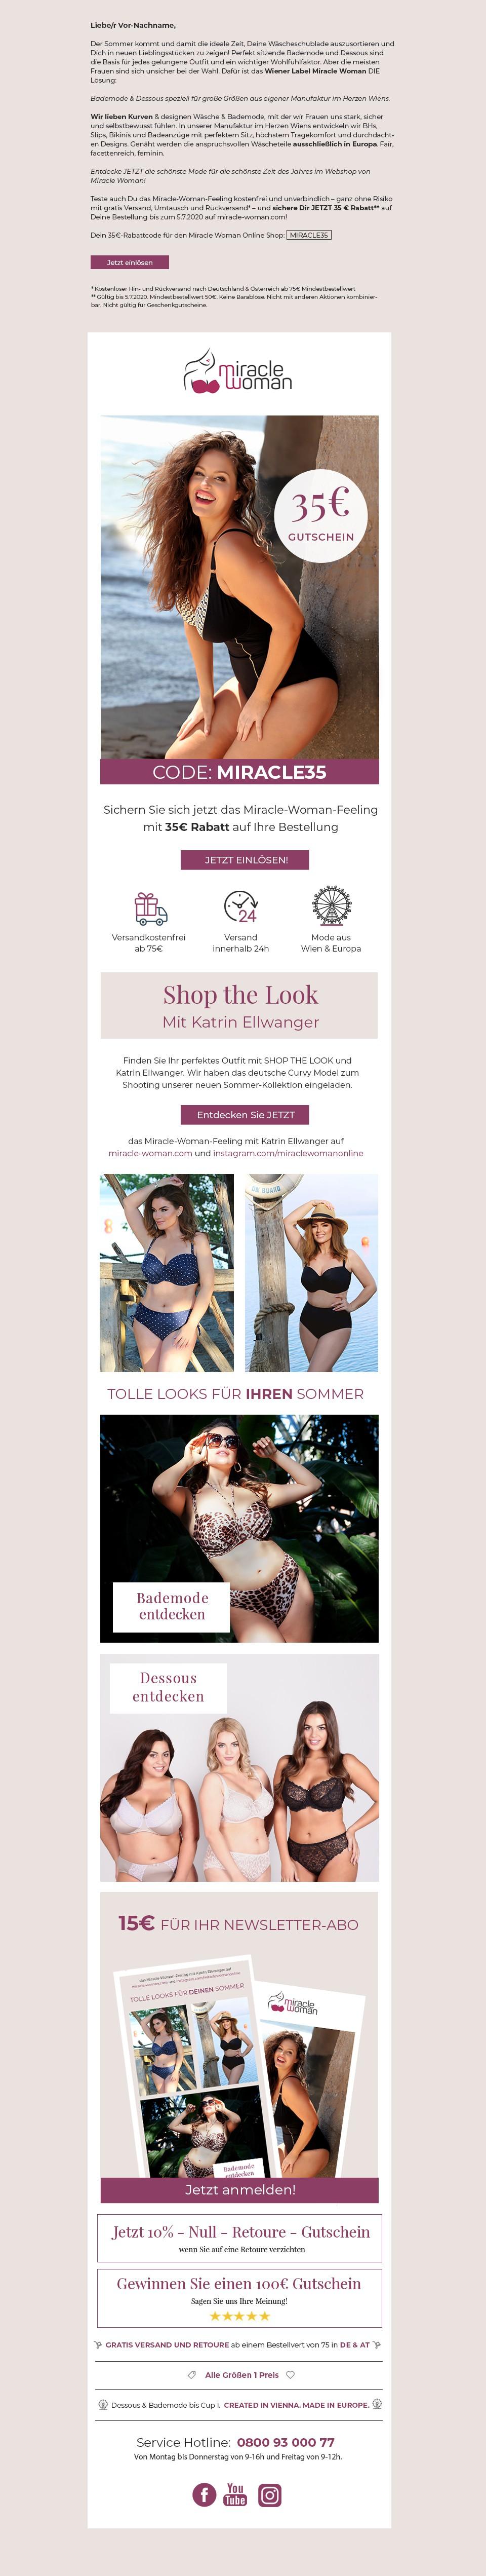 Design Stand Alone Mailing Plus-Size-Lingerie & Bademode für Damen